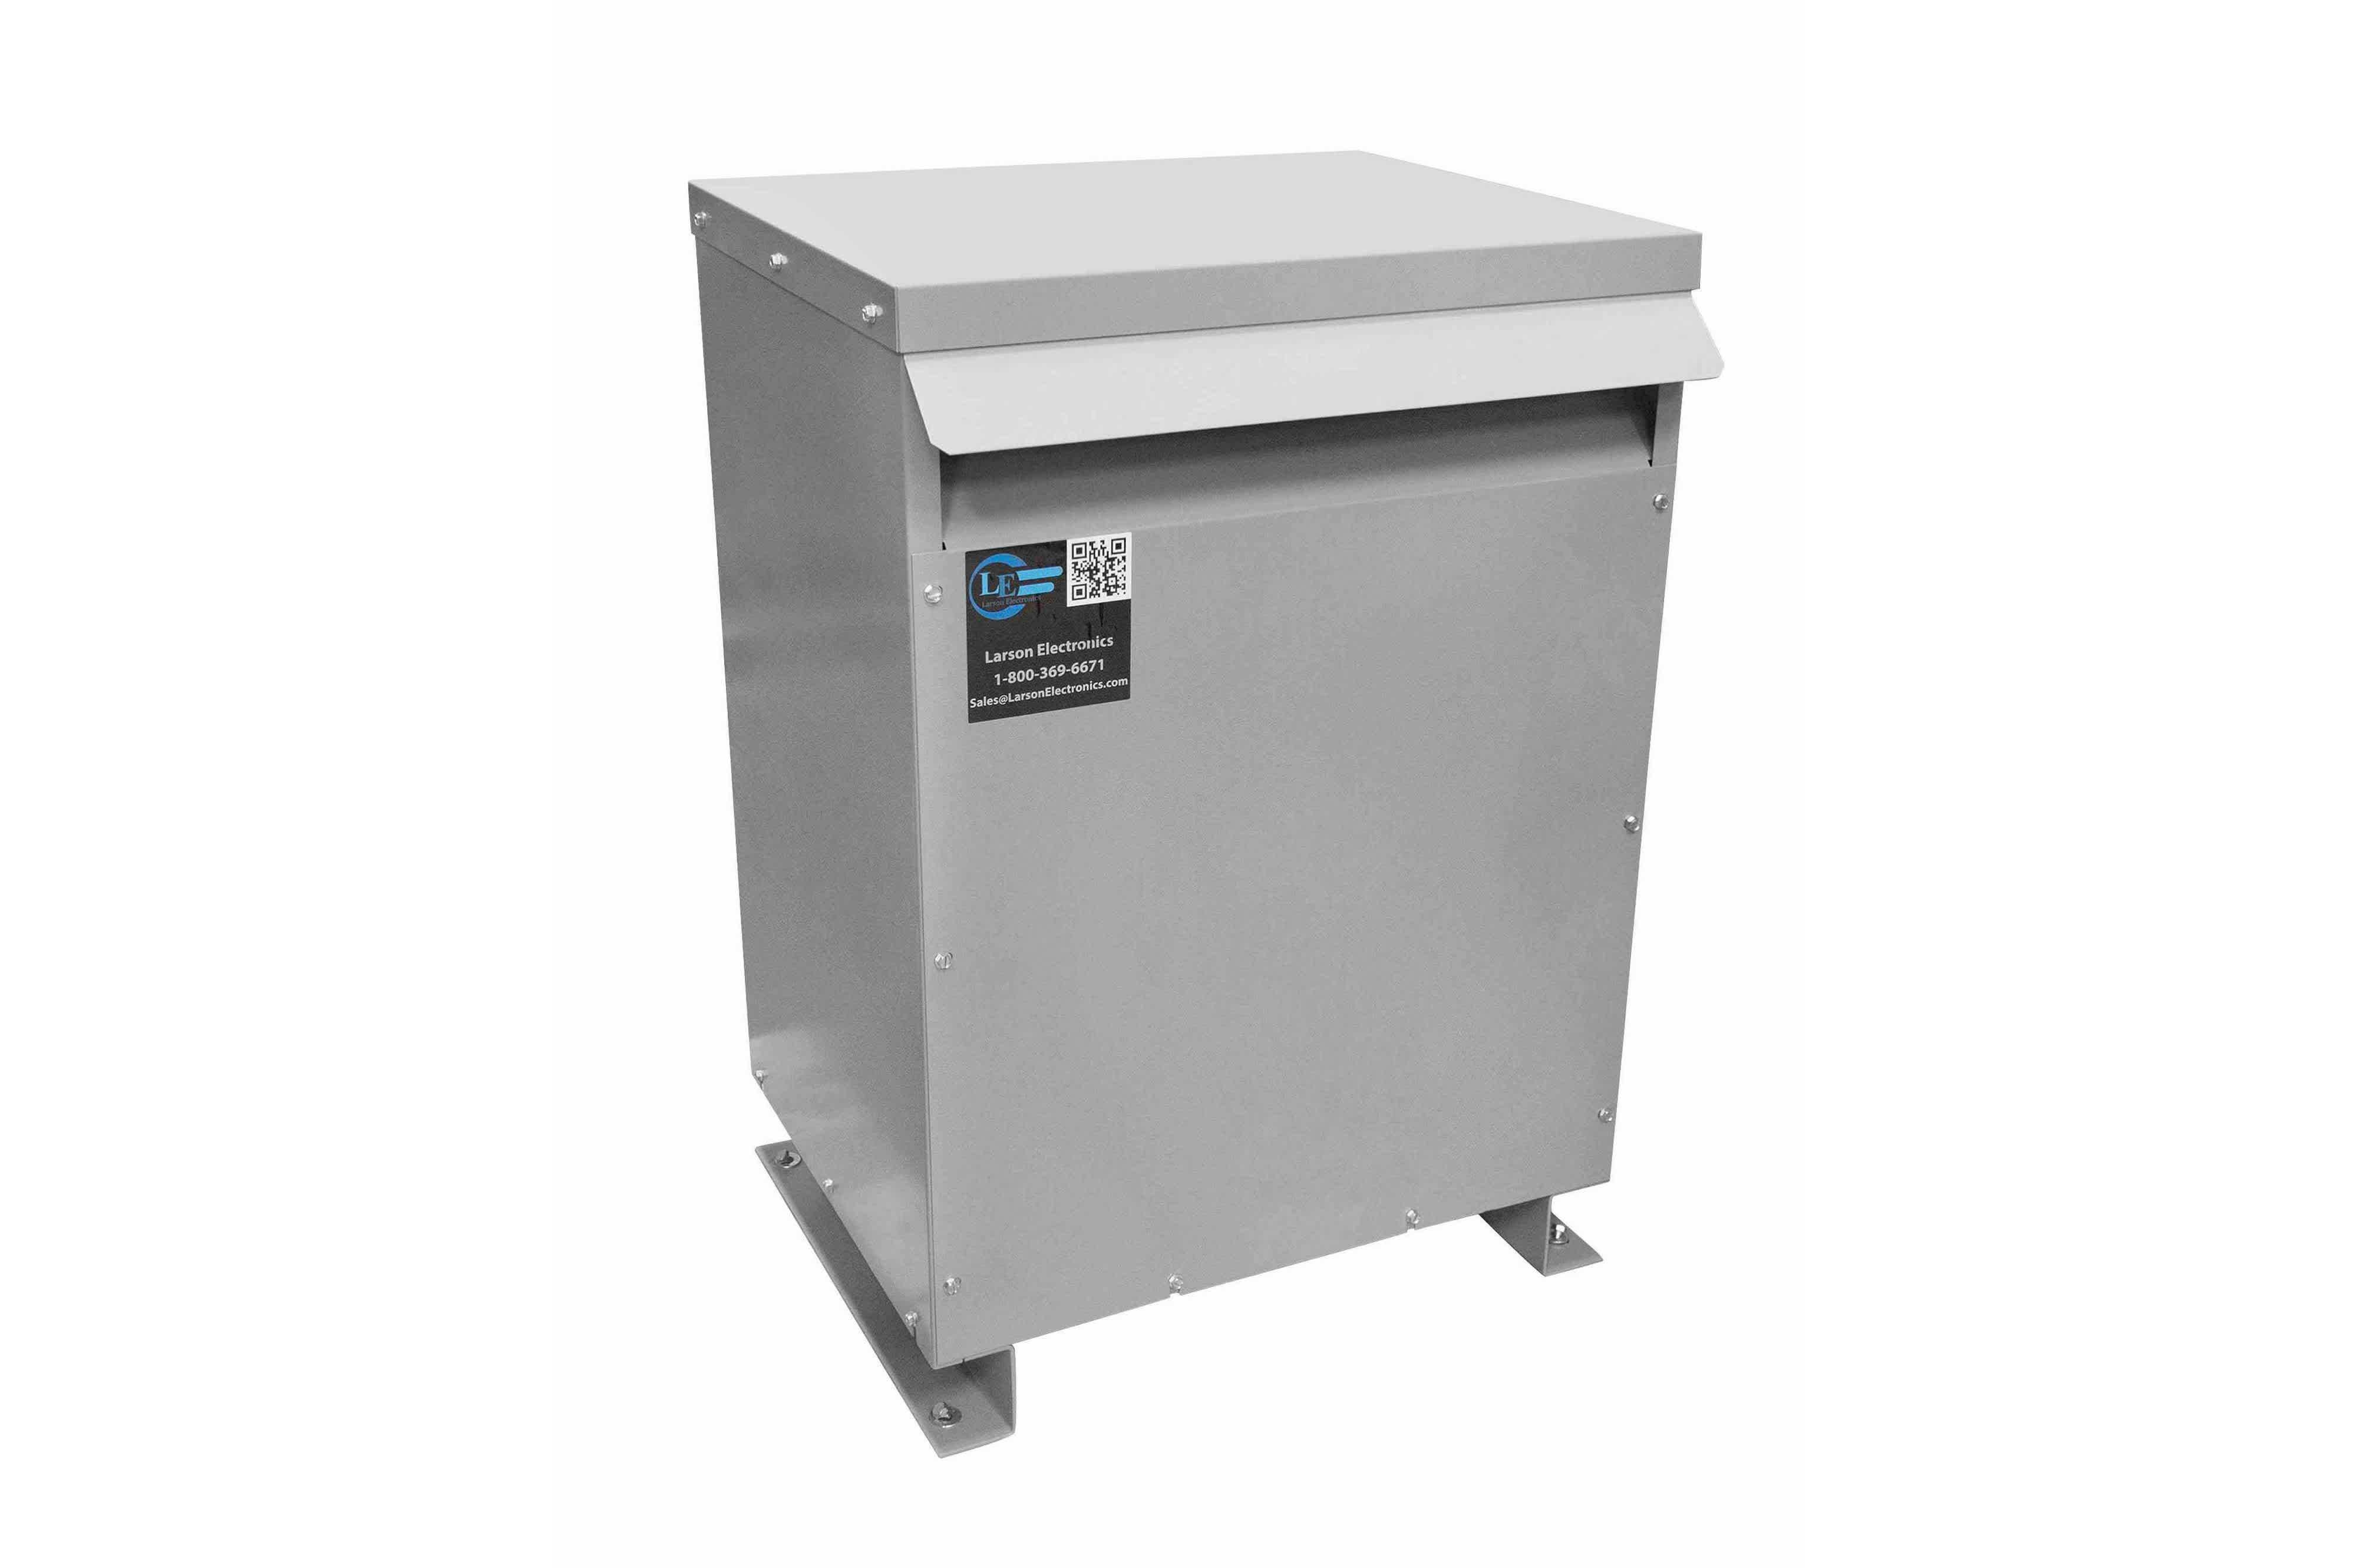 38 kVA 3PH Isolation Transformer, 600V Wye Primary, 460Y/266 Wye-N Secondary, N3R, Ventilated, 60 Hz